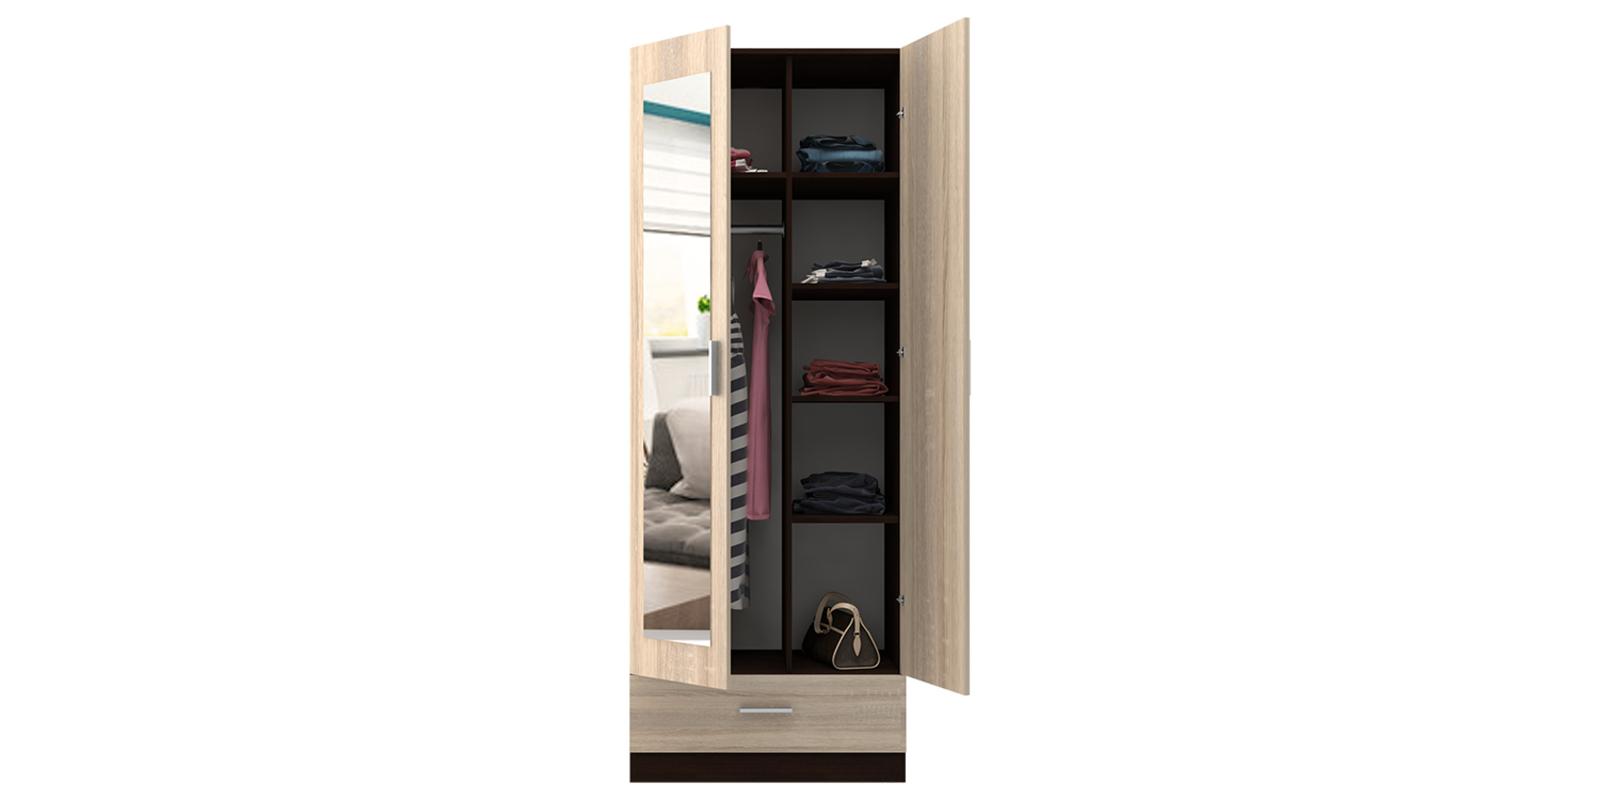 Шкаф распашной двухдверный Мельбурн (дуб феррара/дуб сонома+зеркало) от HomeMe.ru